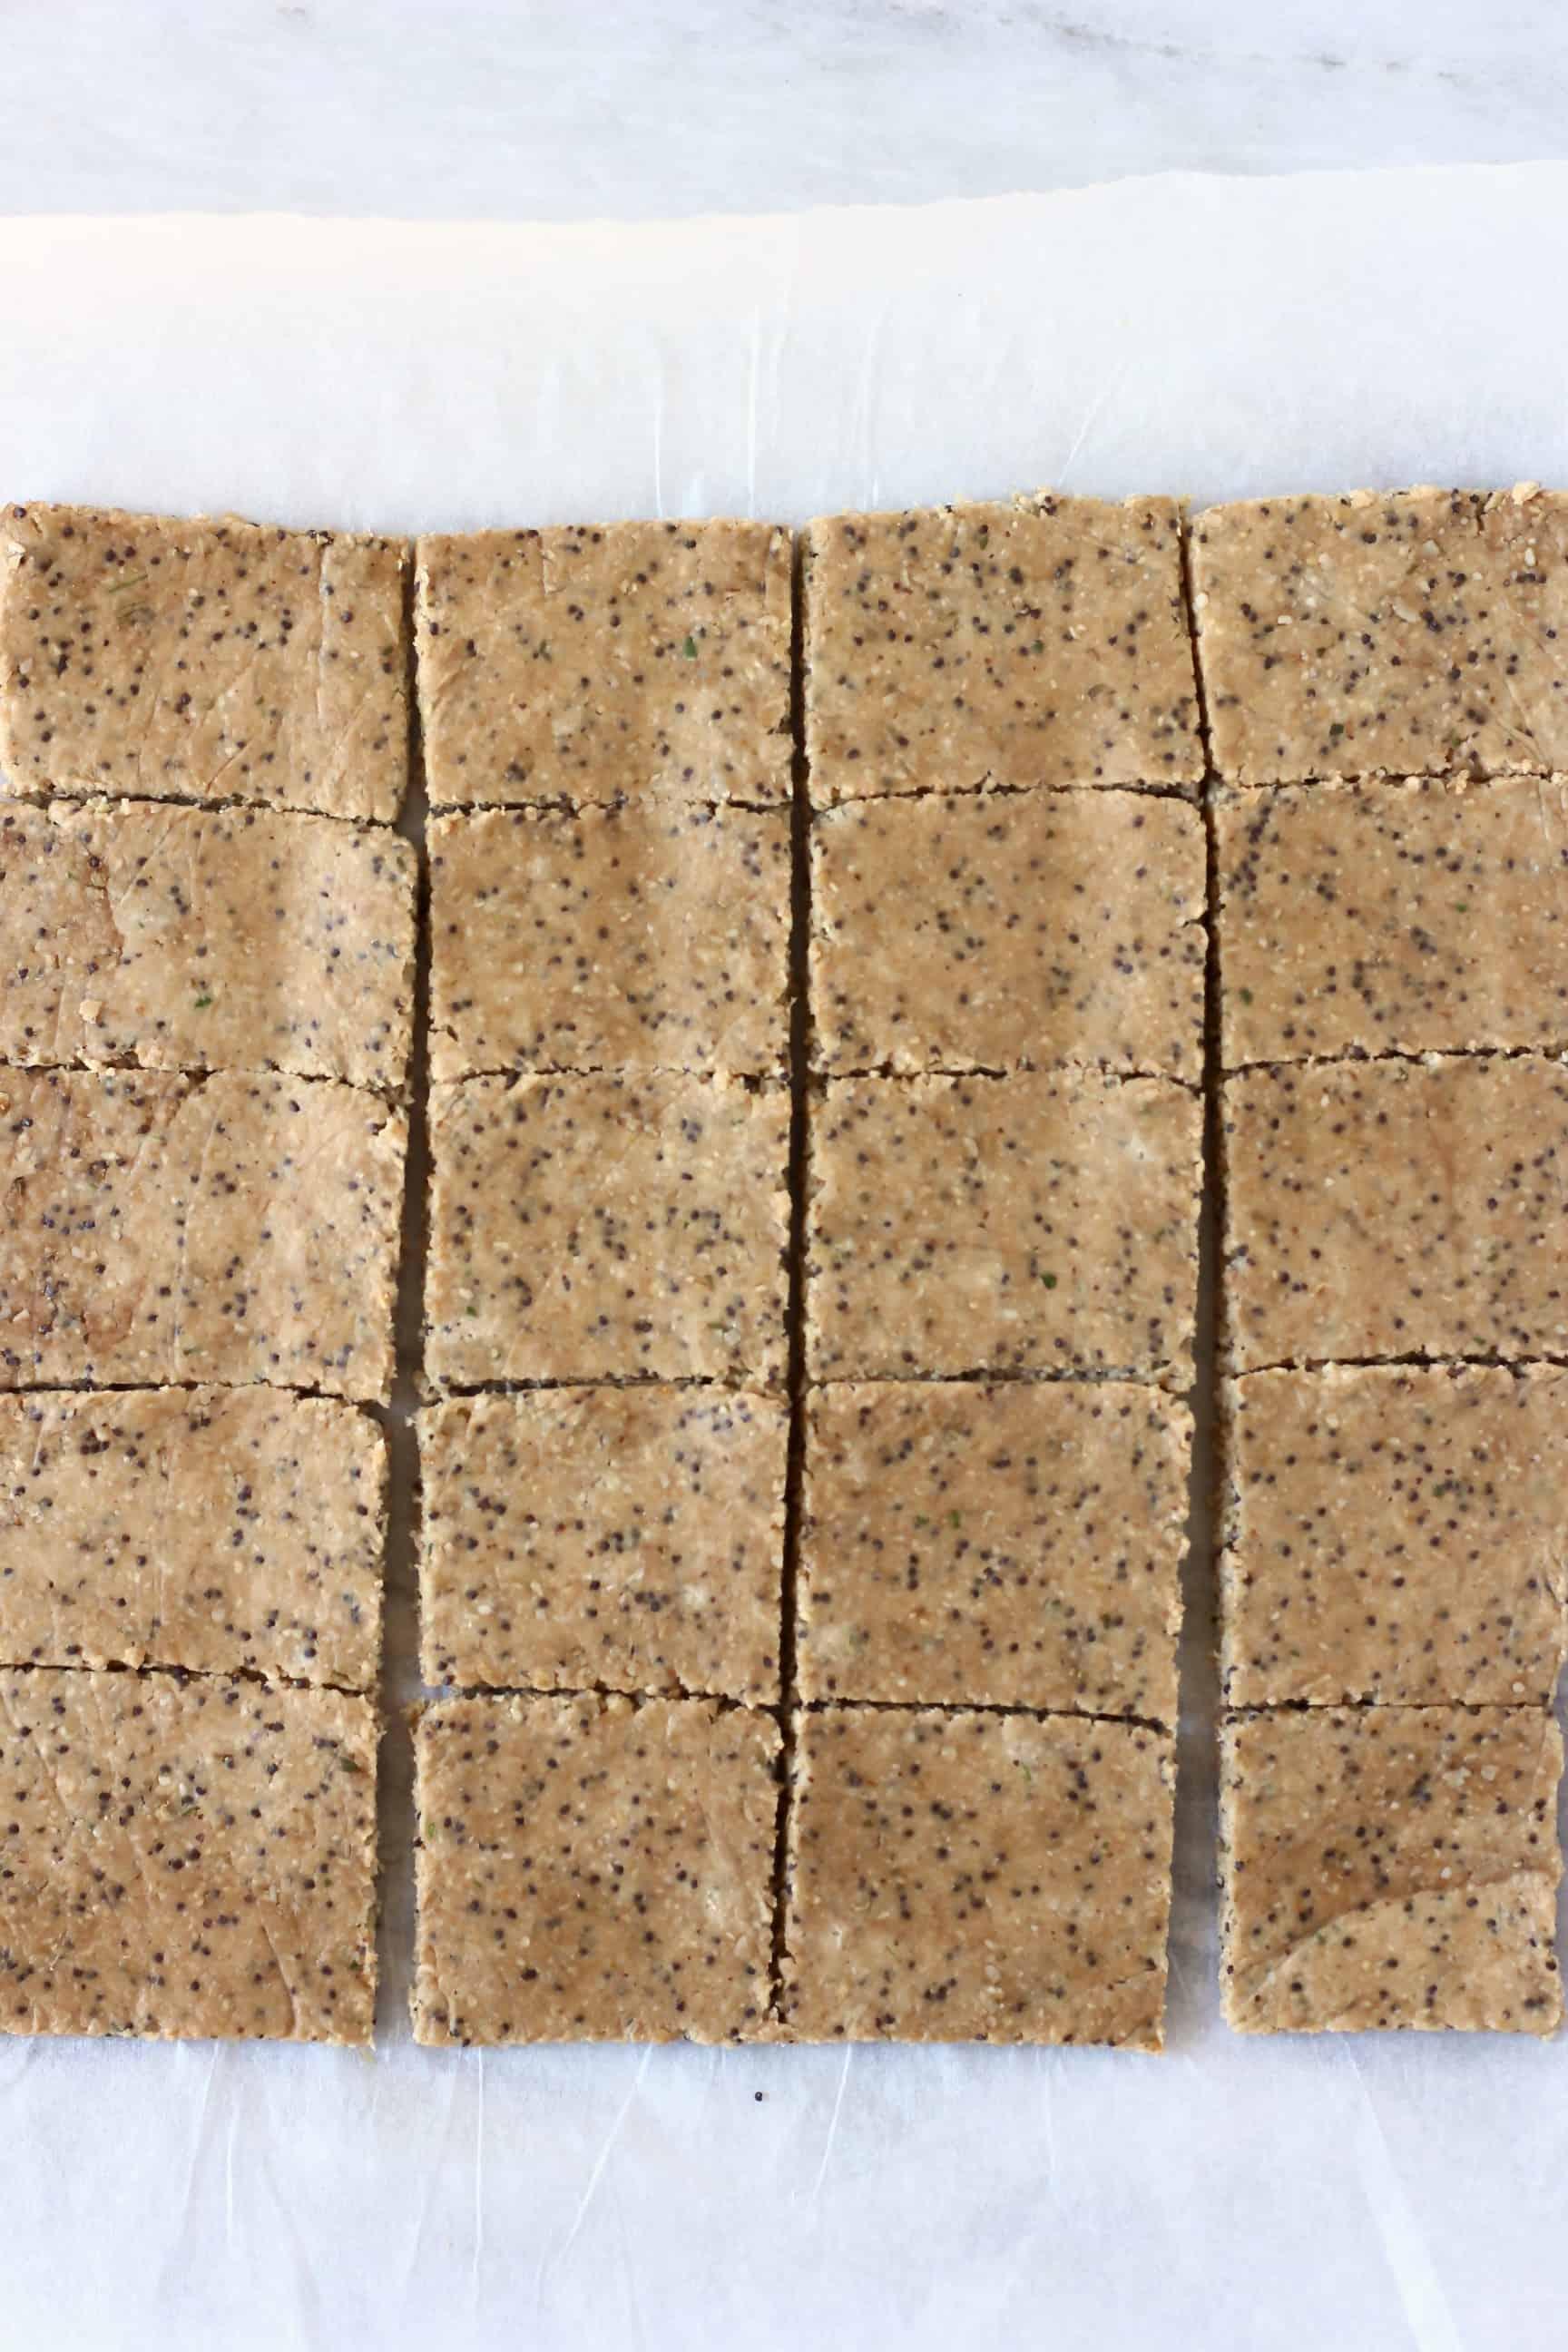 Squares of raw gluten-free vegan cracker mixture on a sheet of baking paper